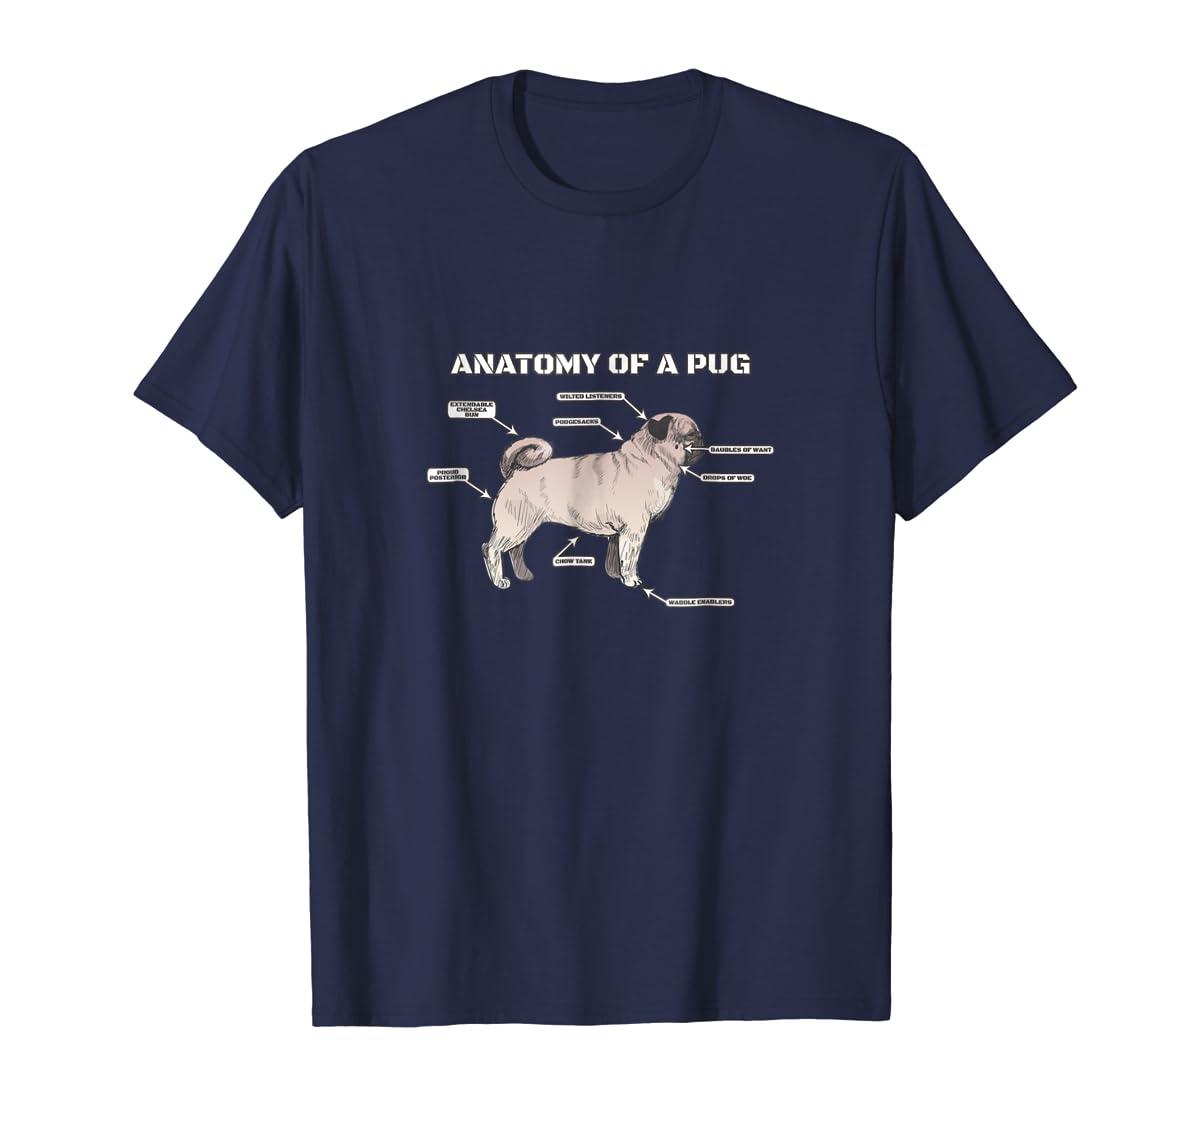 Cute Pug Anatomy T-Shirt - Funny Dog Puppy Tee-Men's T-Shirt-Navy